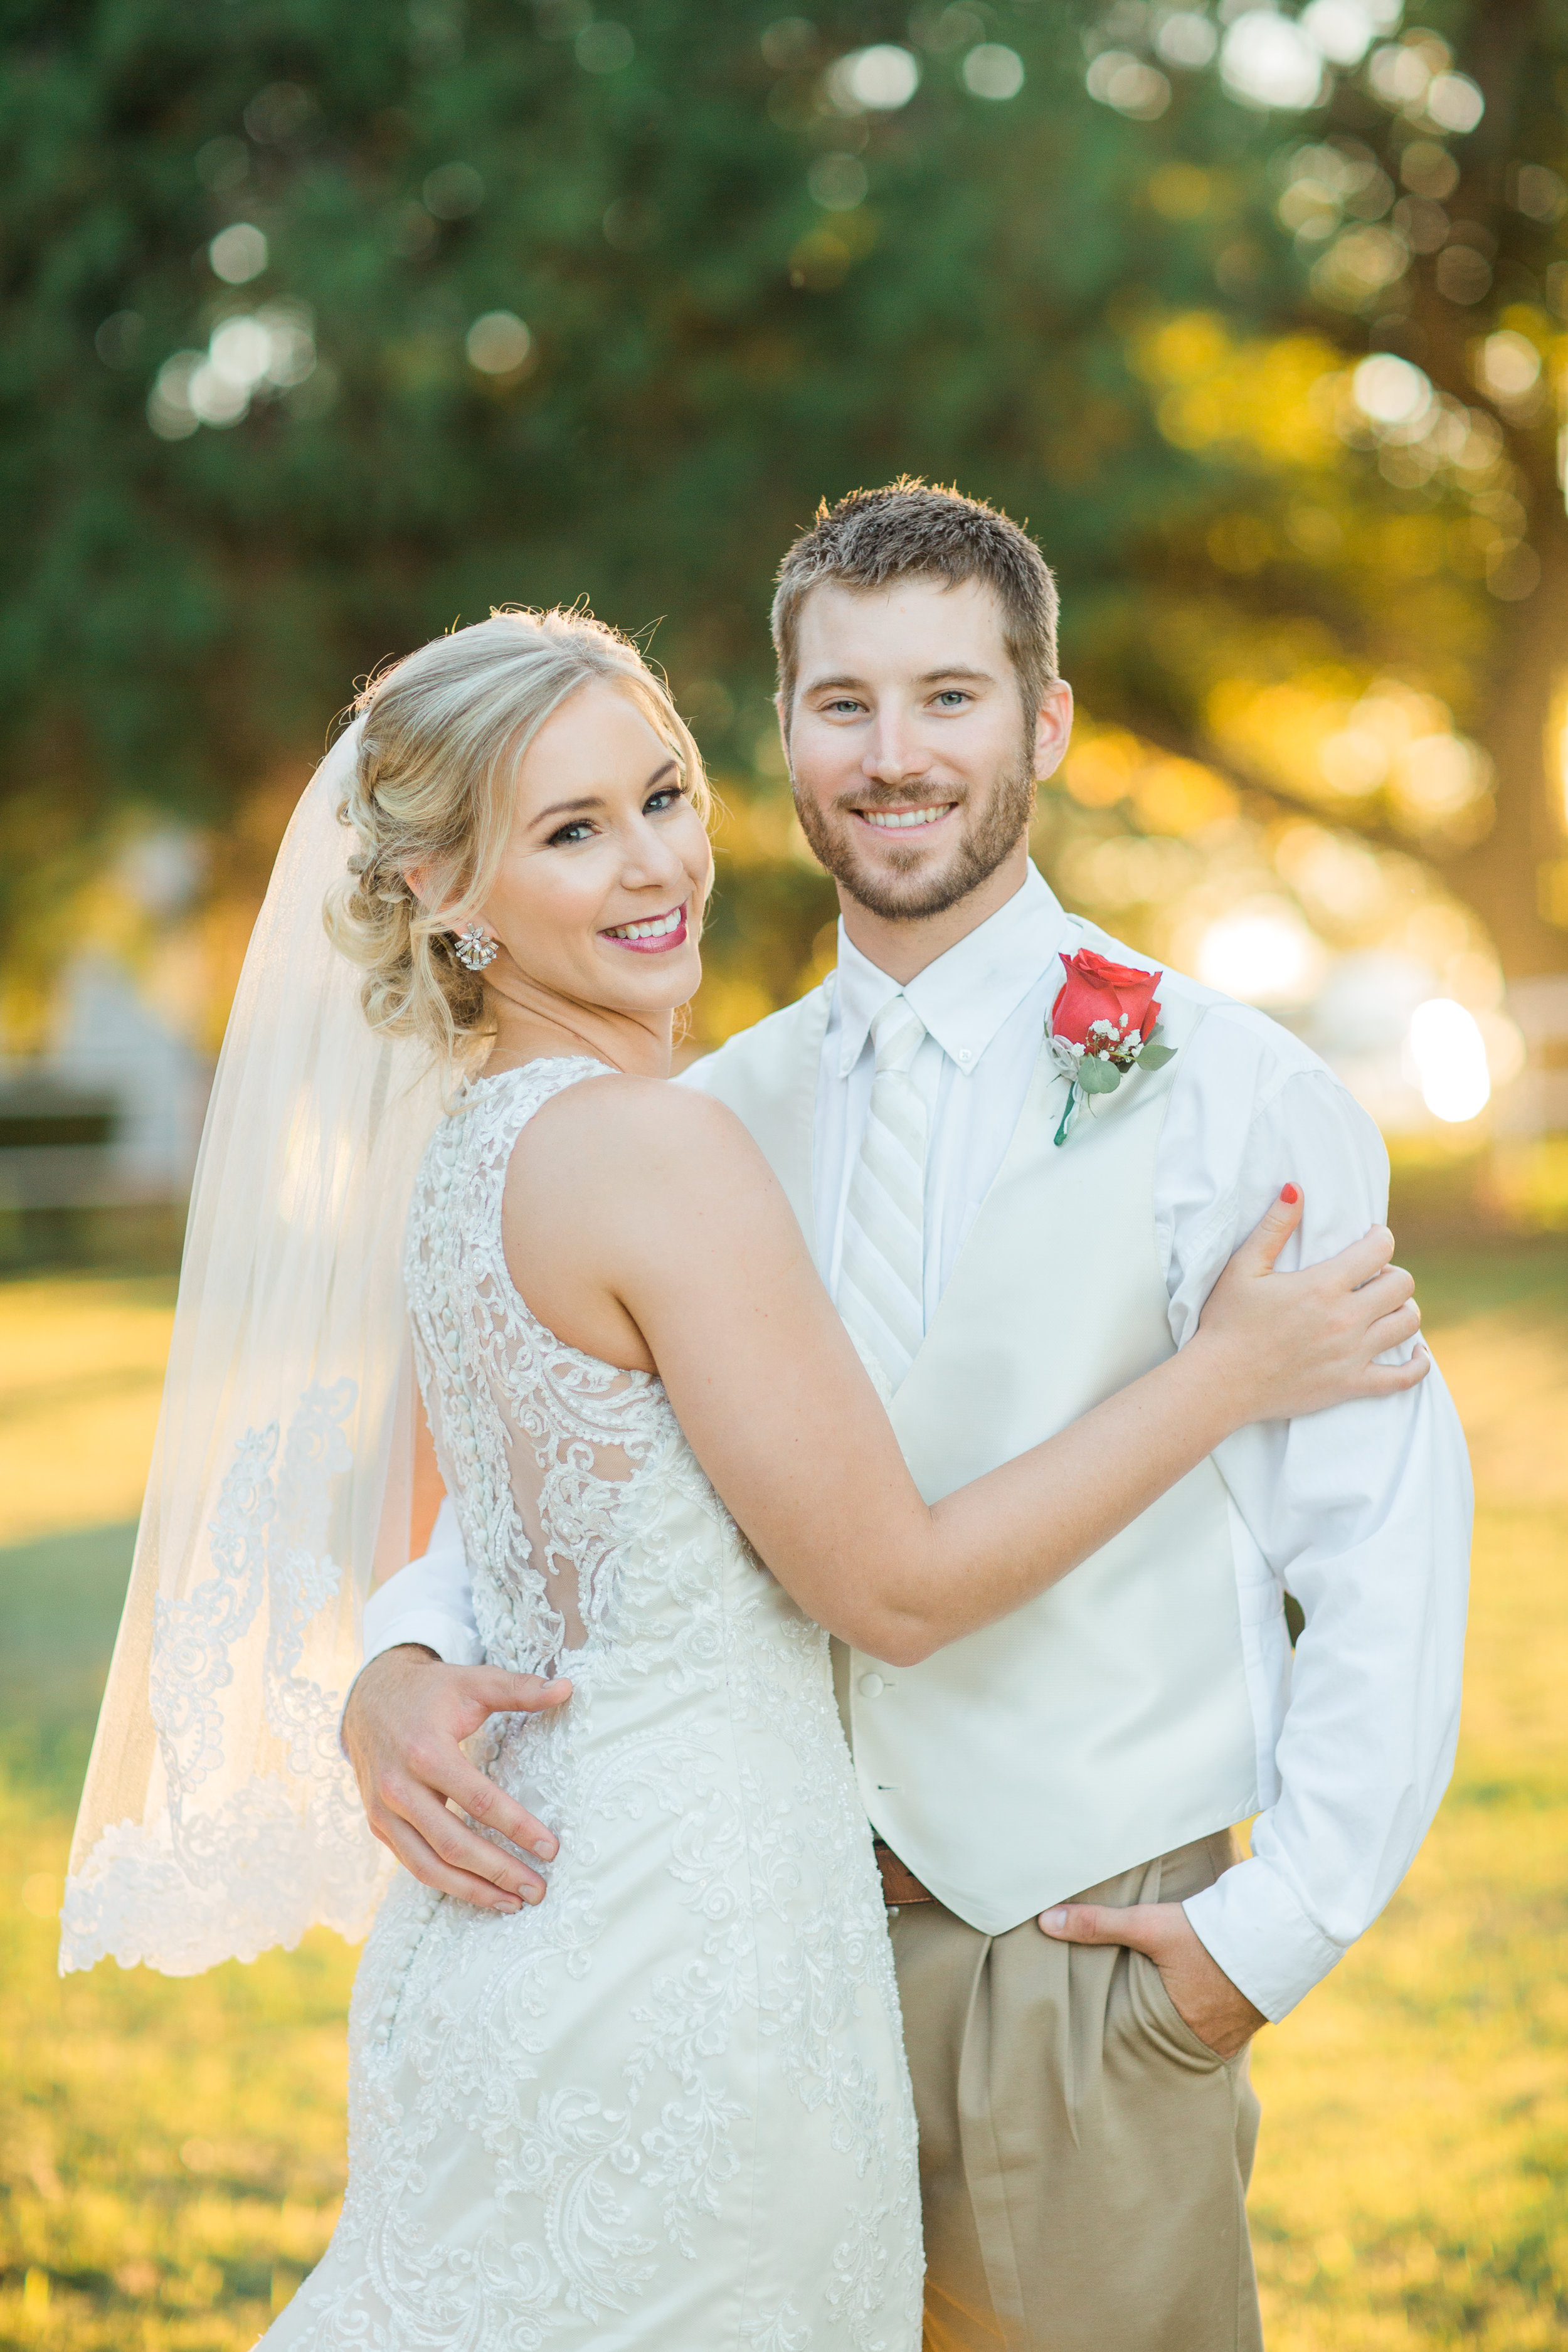 Bailey-Nathan-Windthorst-Texas-Wedding-050.jpg